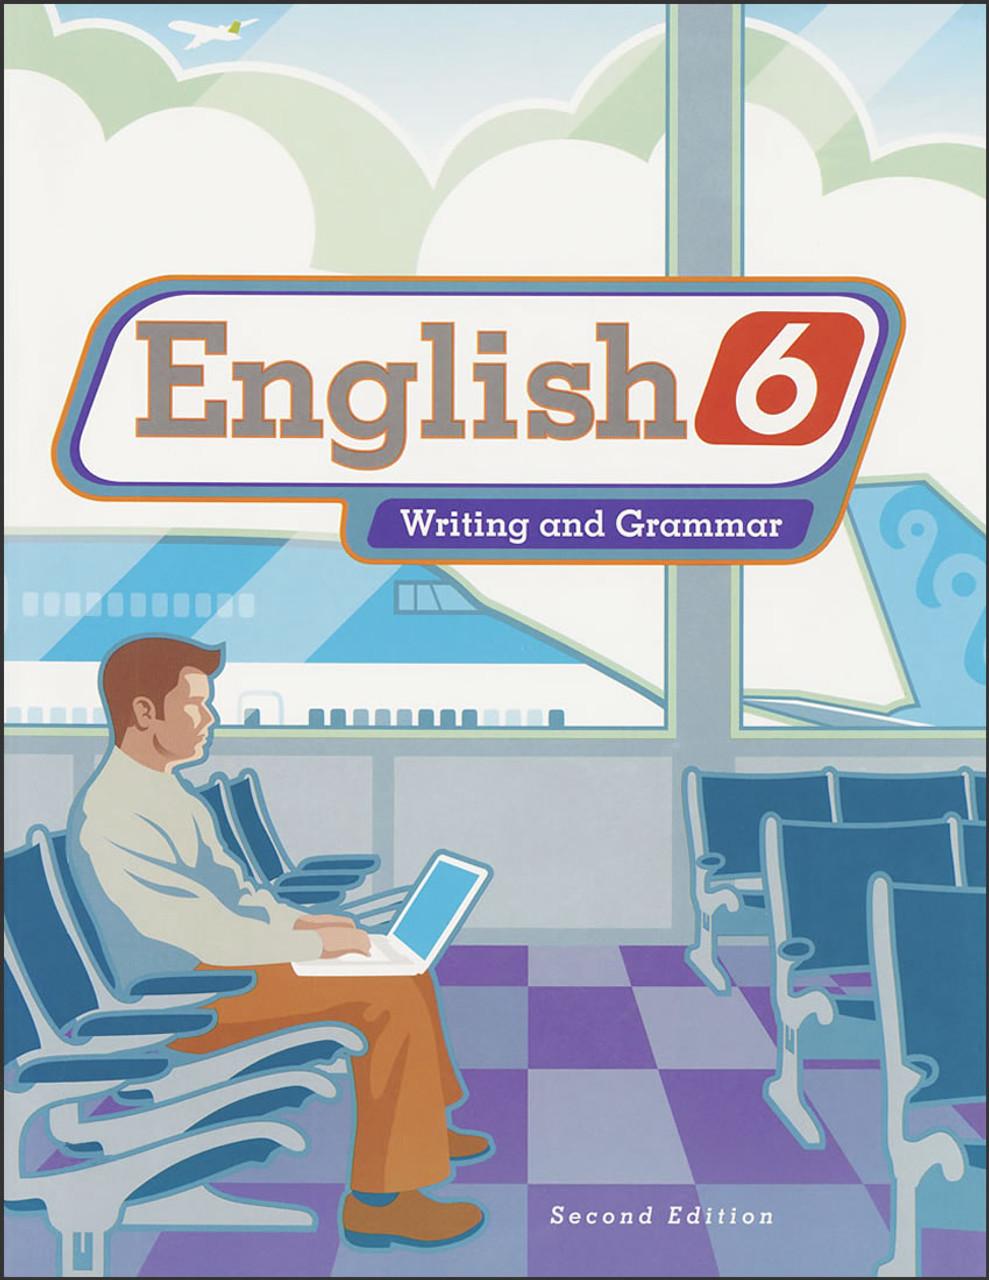 English 6, 2nd edition